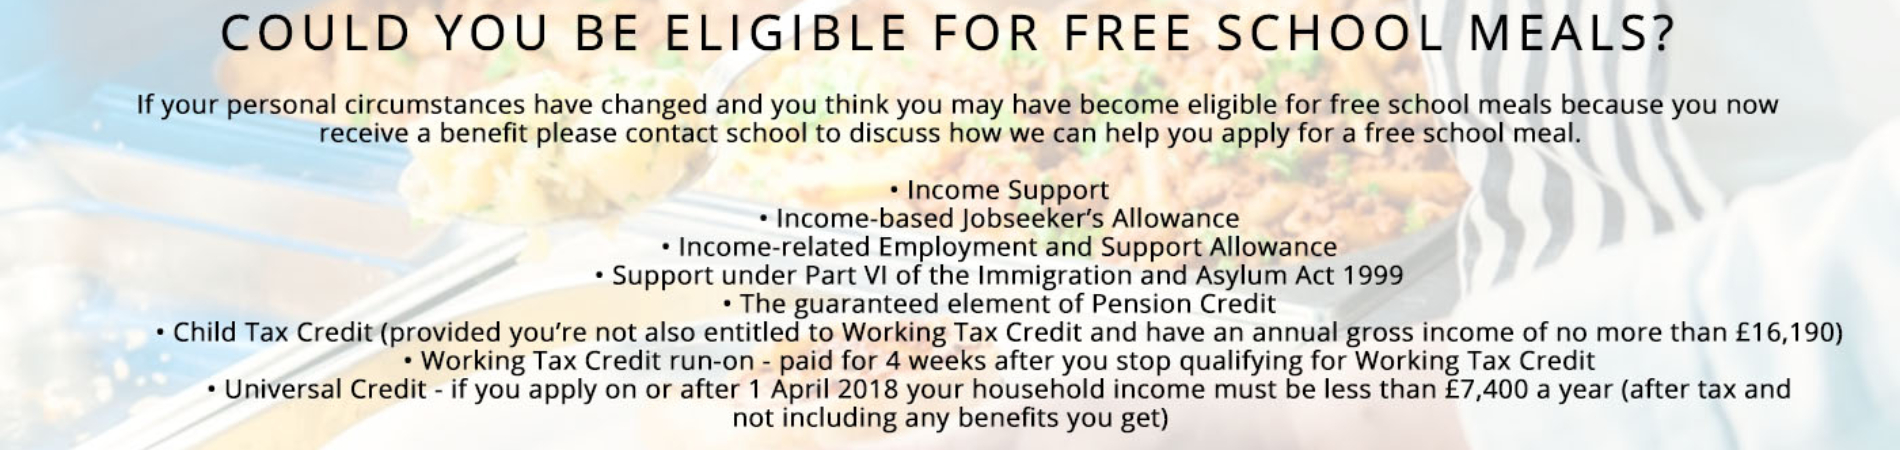 freeschoolmealbanner-1900x450_c